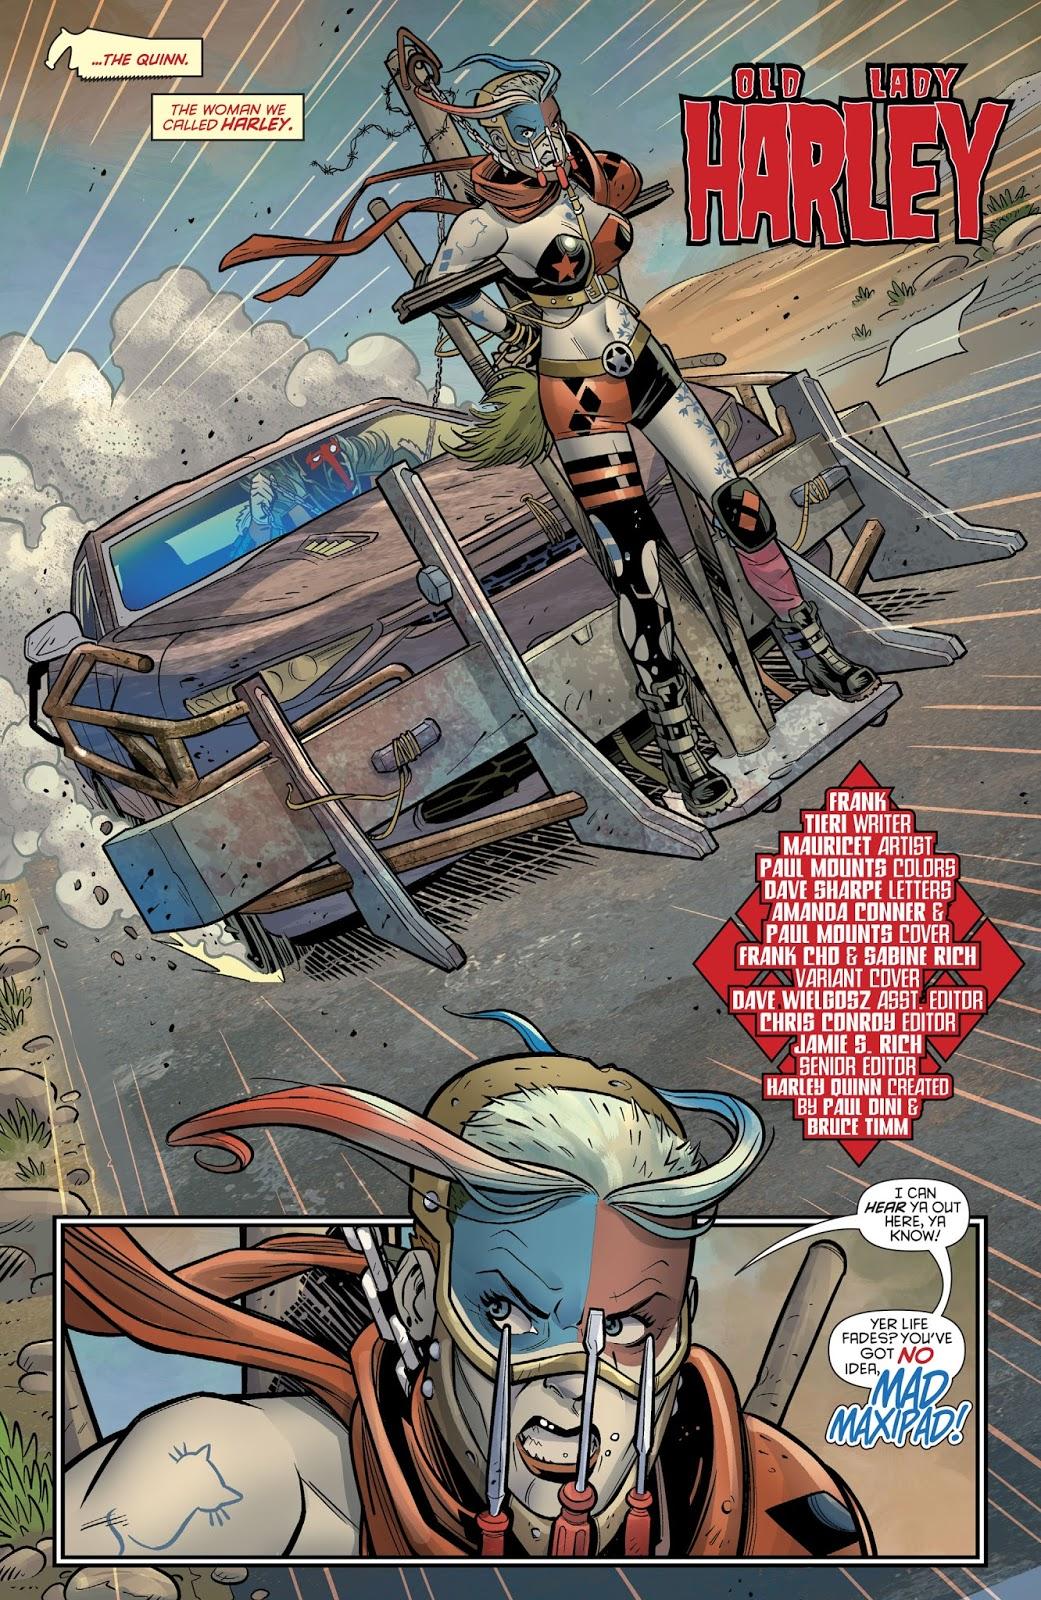 Mad Max Harley Quinn